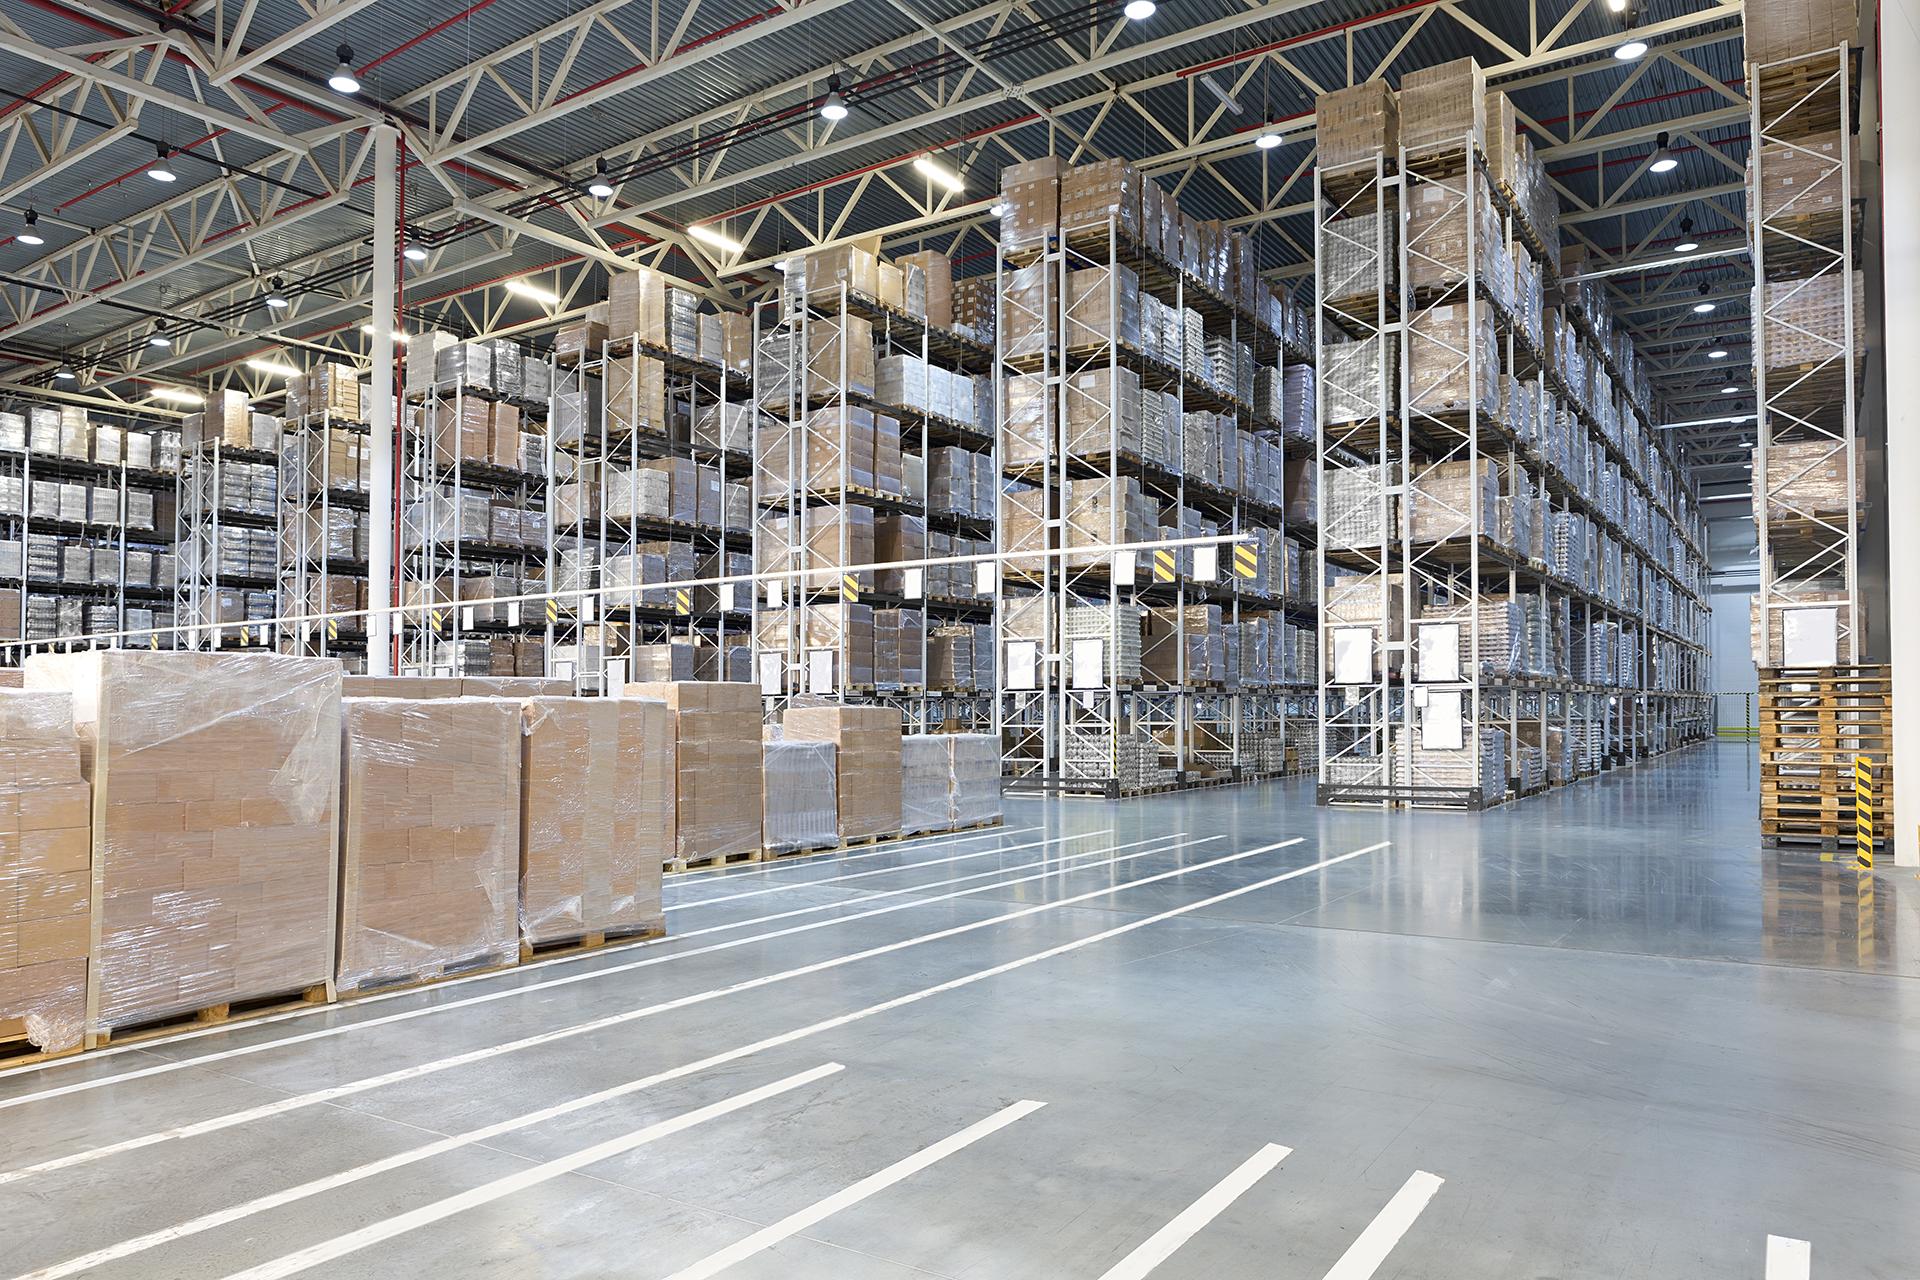 Warehouse Pallet-Racking System